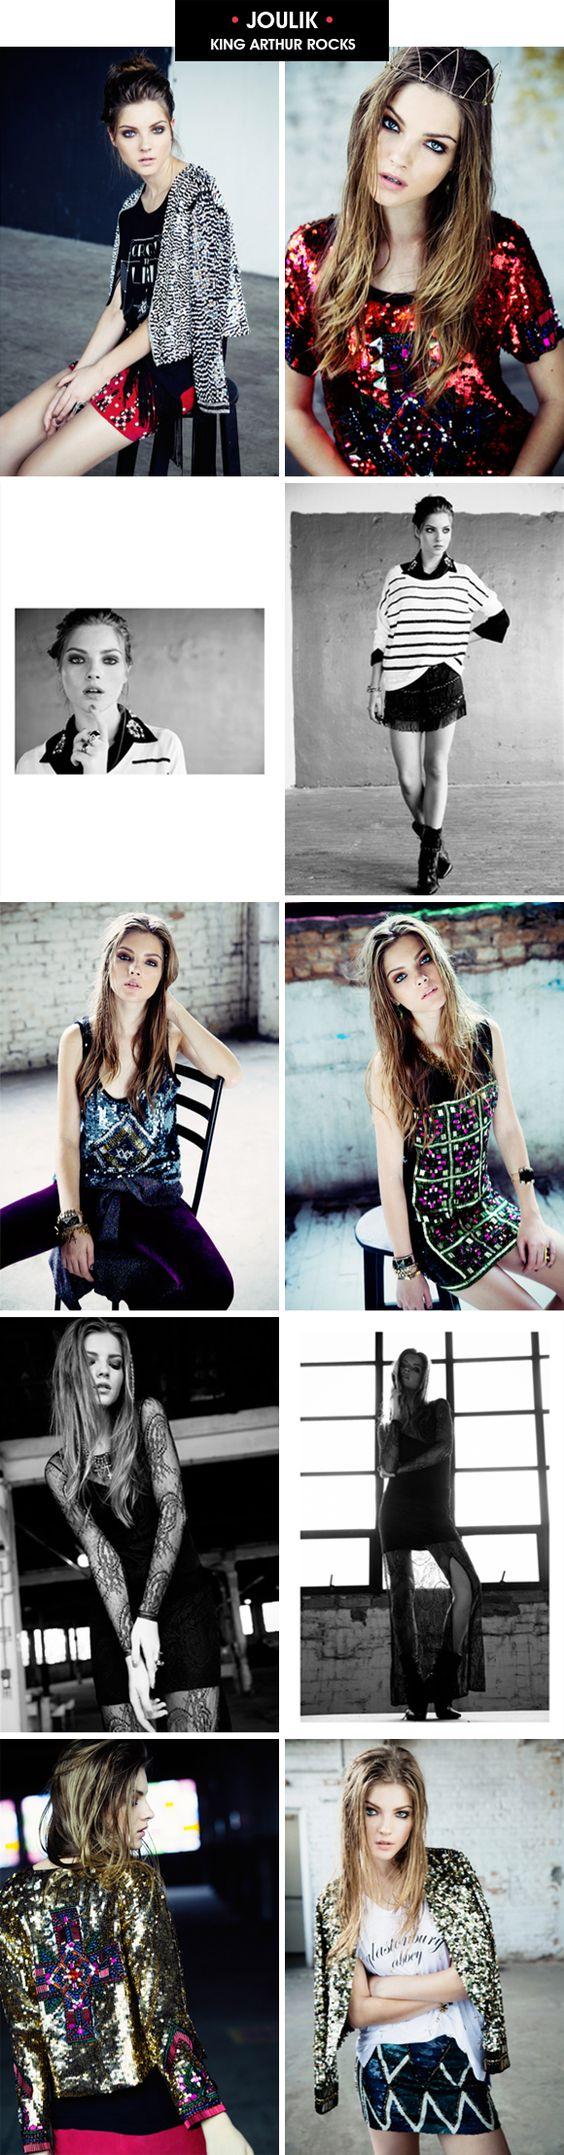 Achados da Bia | Moda | Lançamento Inverno 2013 | Joulik | King Arthur - http://www.achadosdabia.com.br